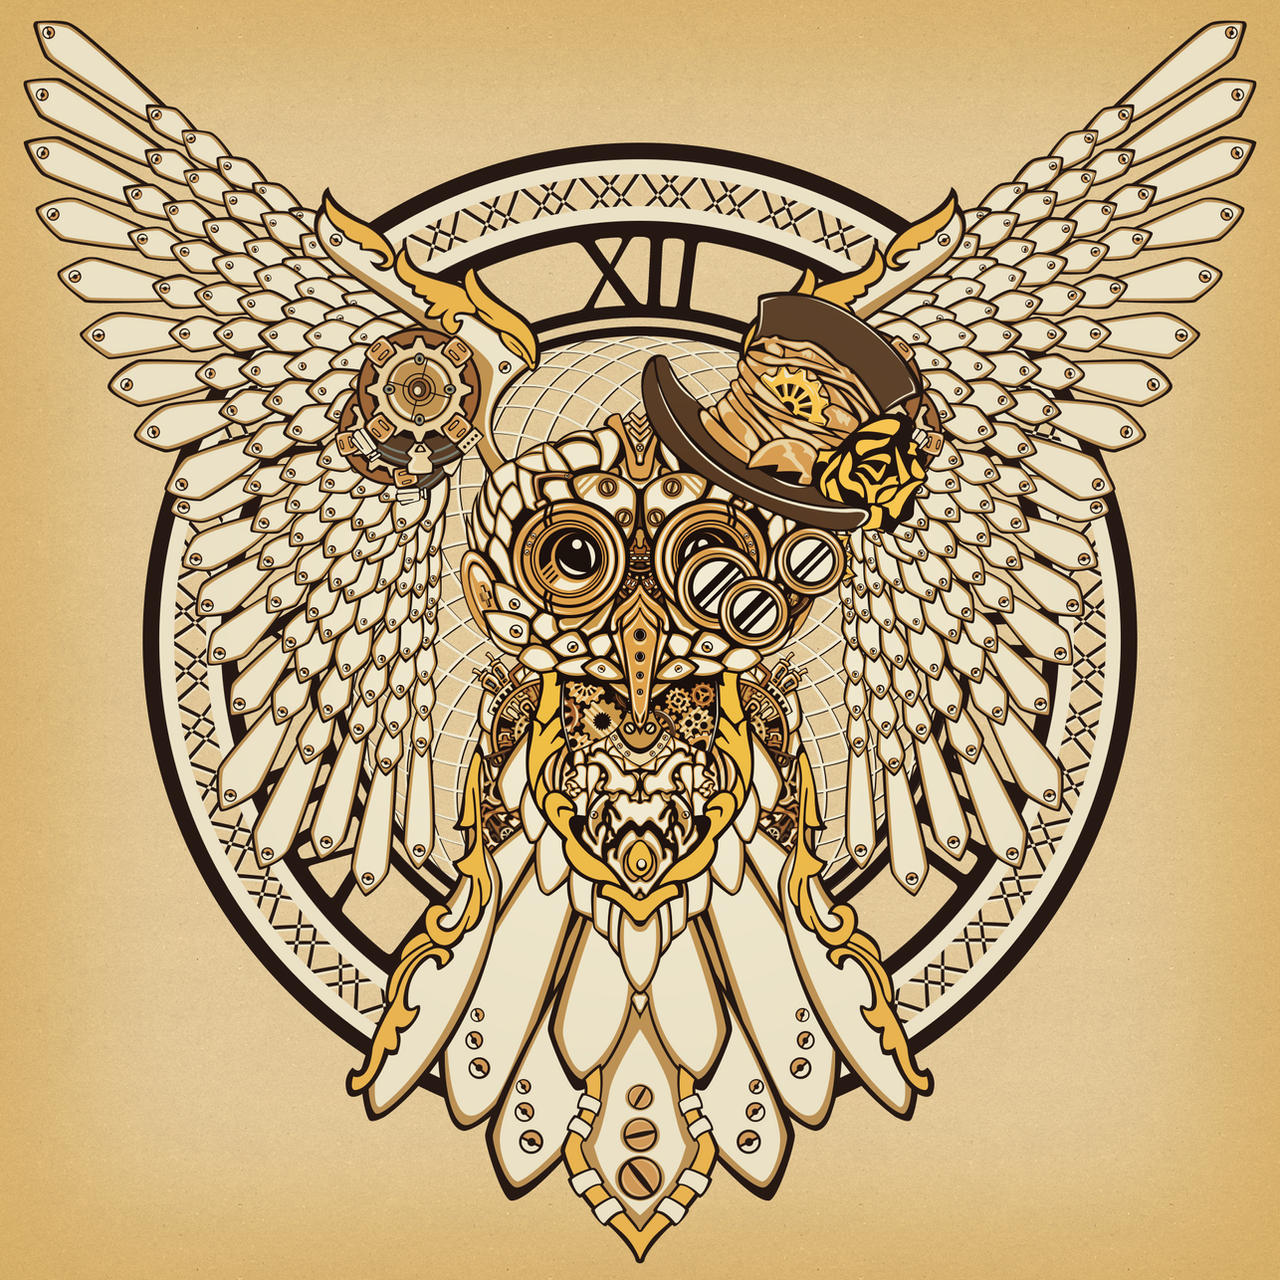 Steampunk Owl by KenshinPony on DeviantArt